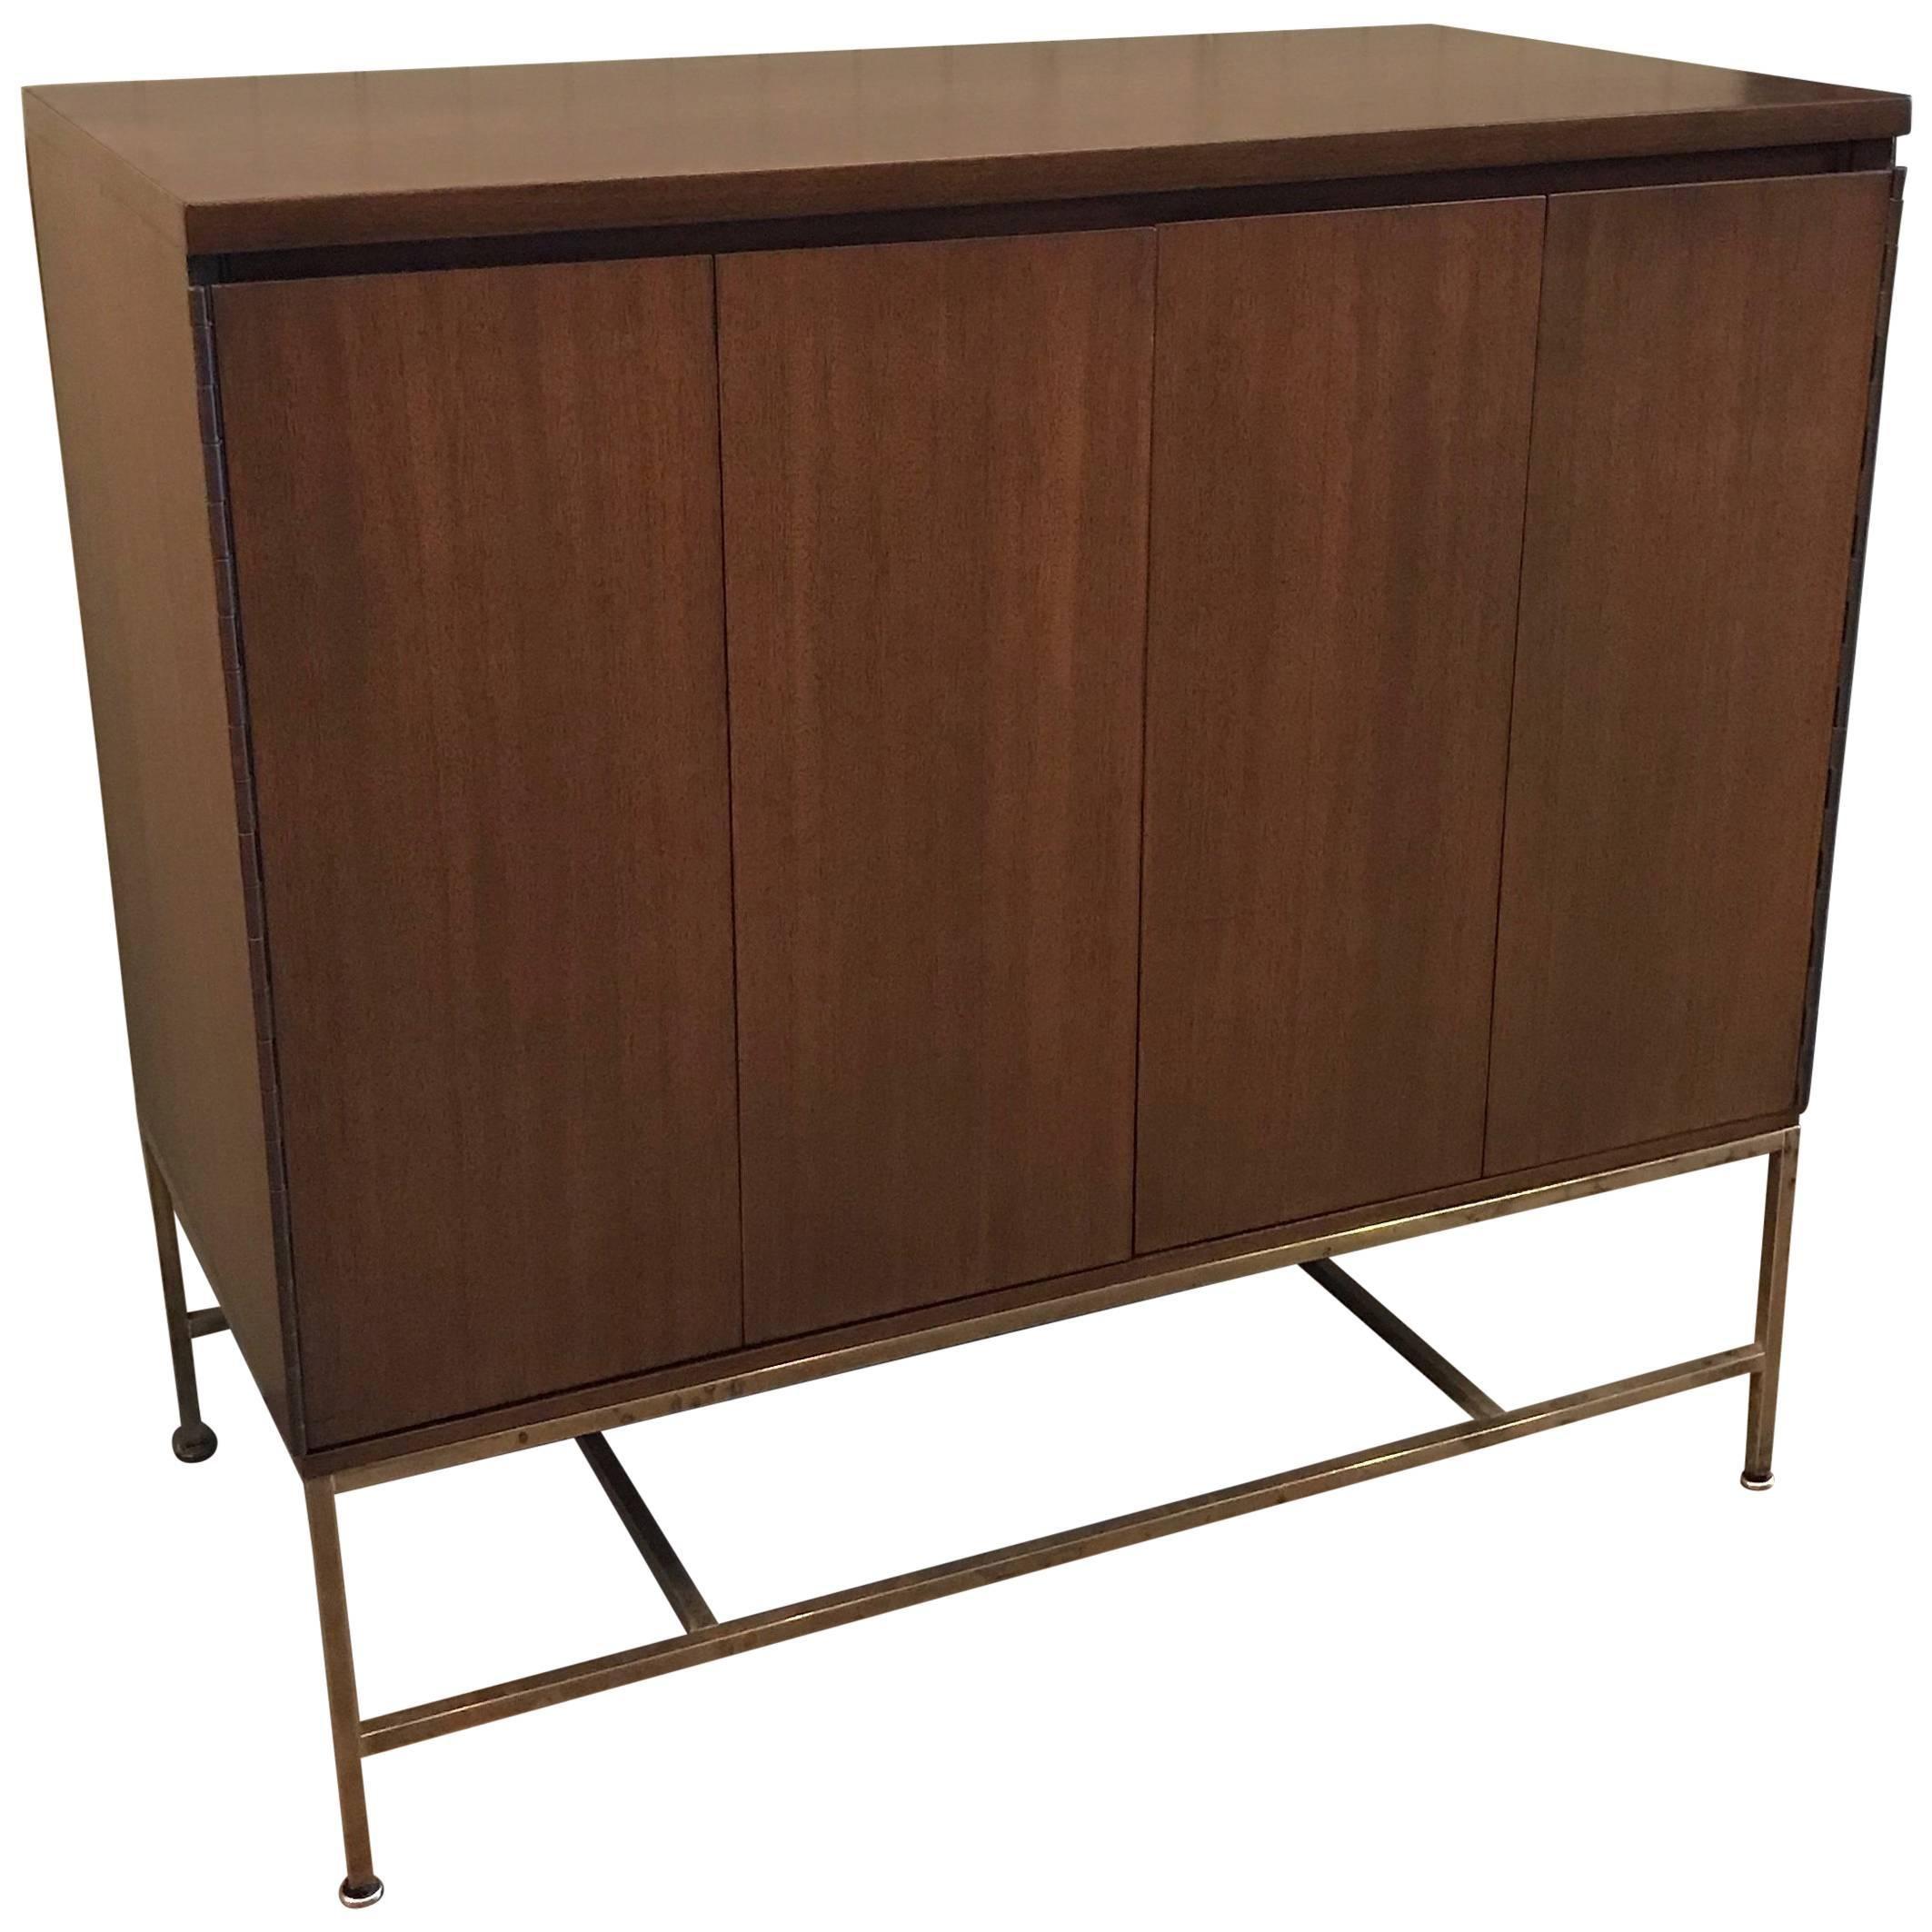 Paul McCobb Mahogany Bi-Fold Doors Dresser for Calvin Irwin Collection